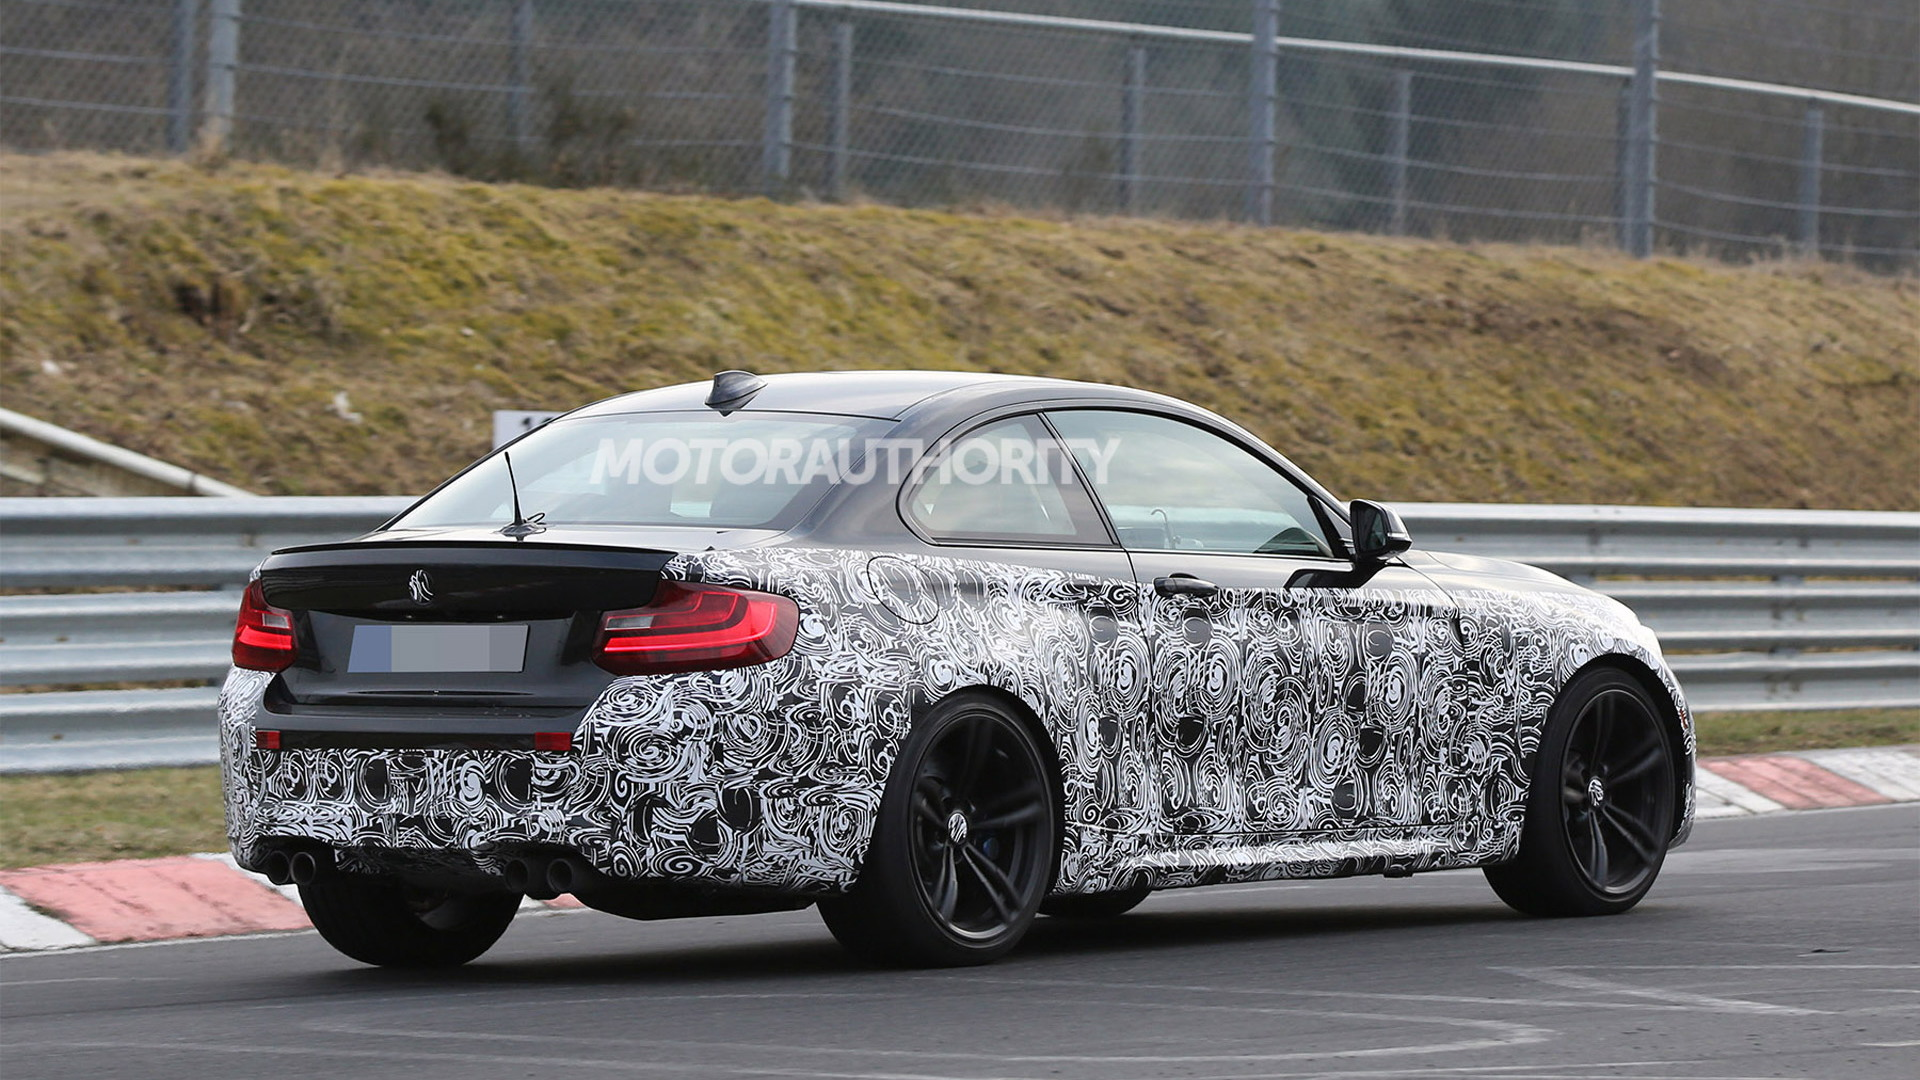 2016 BMW M2 spy shots - Image via S. Baldauf/SB-Medien